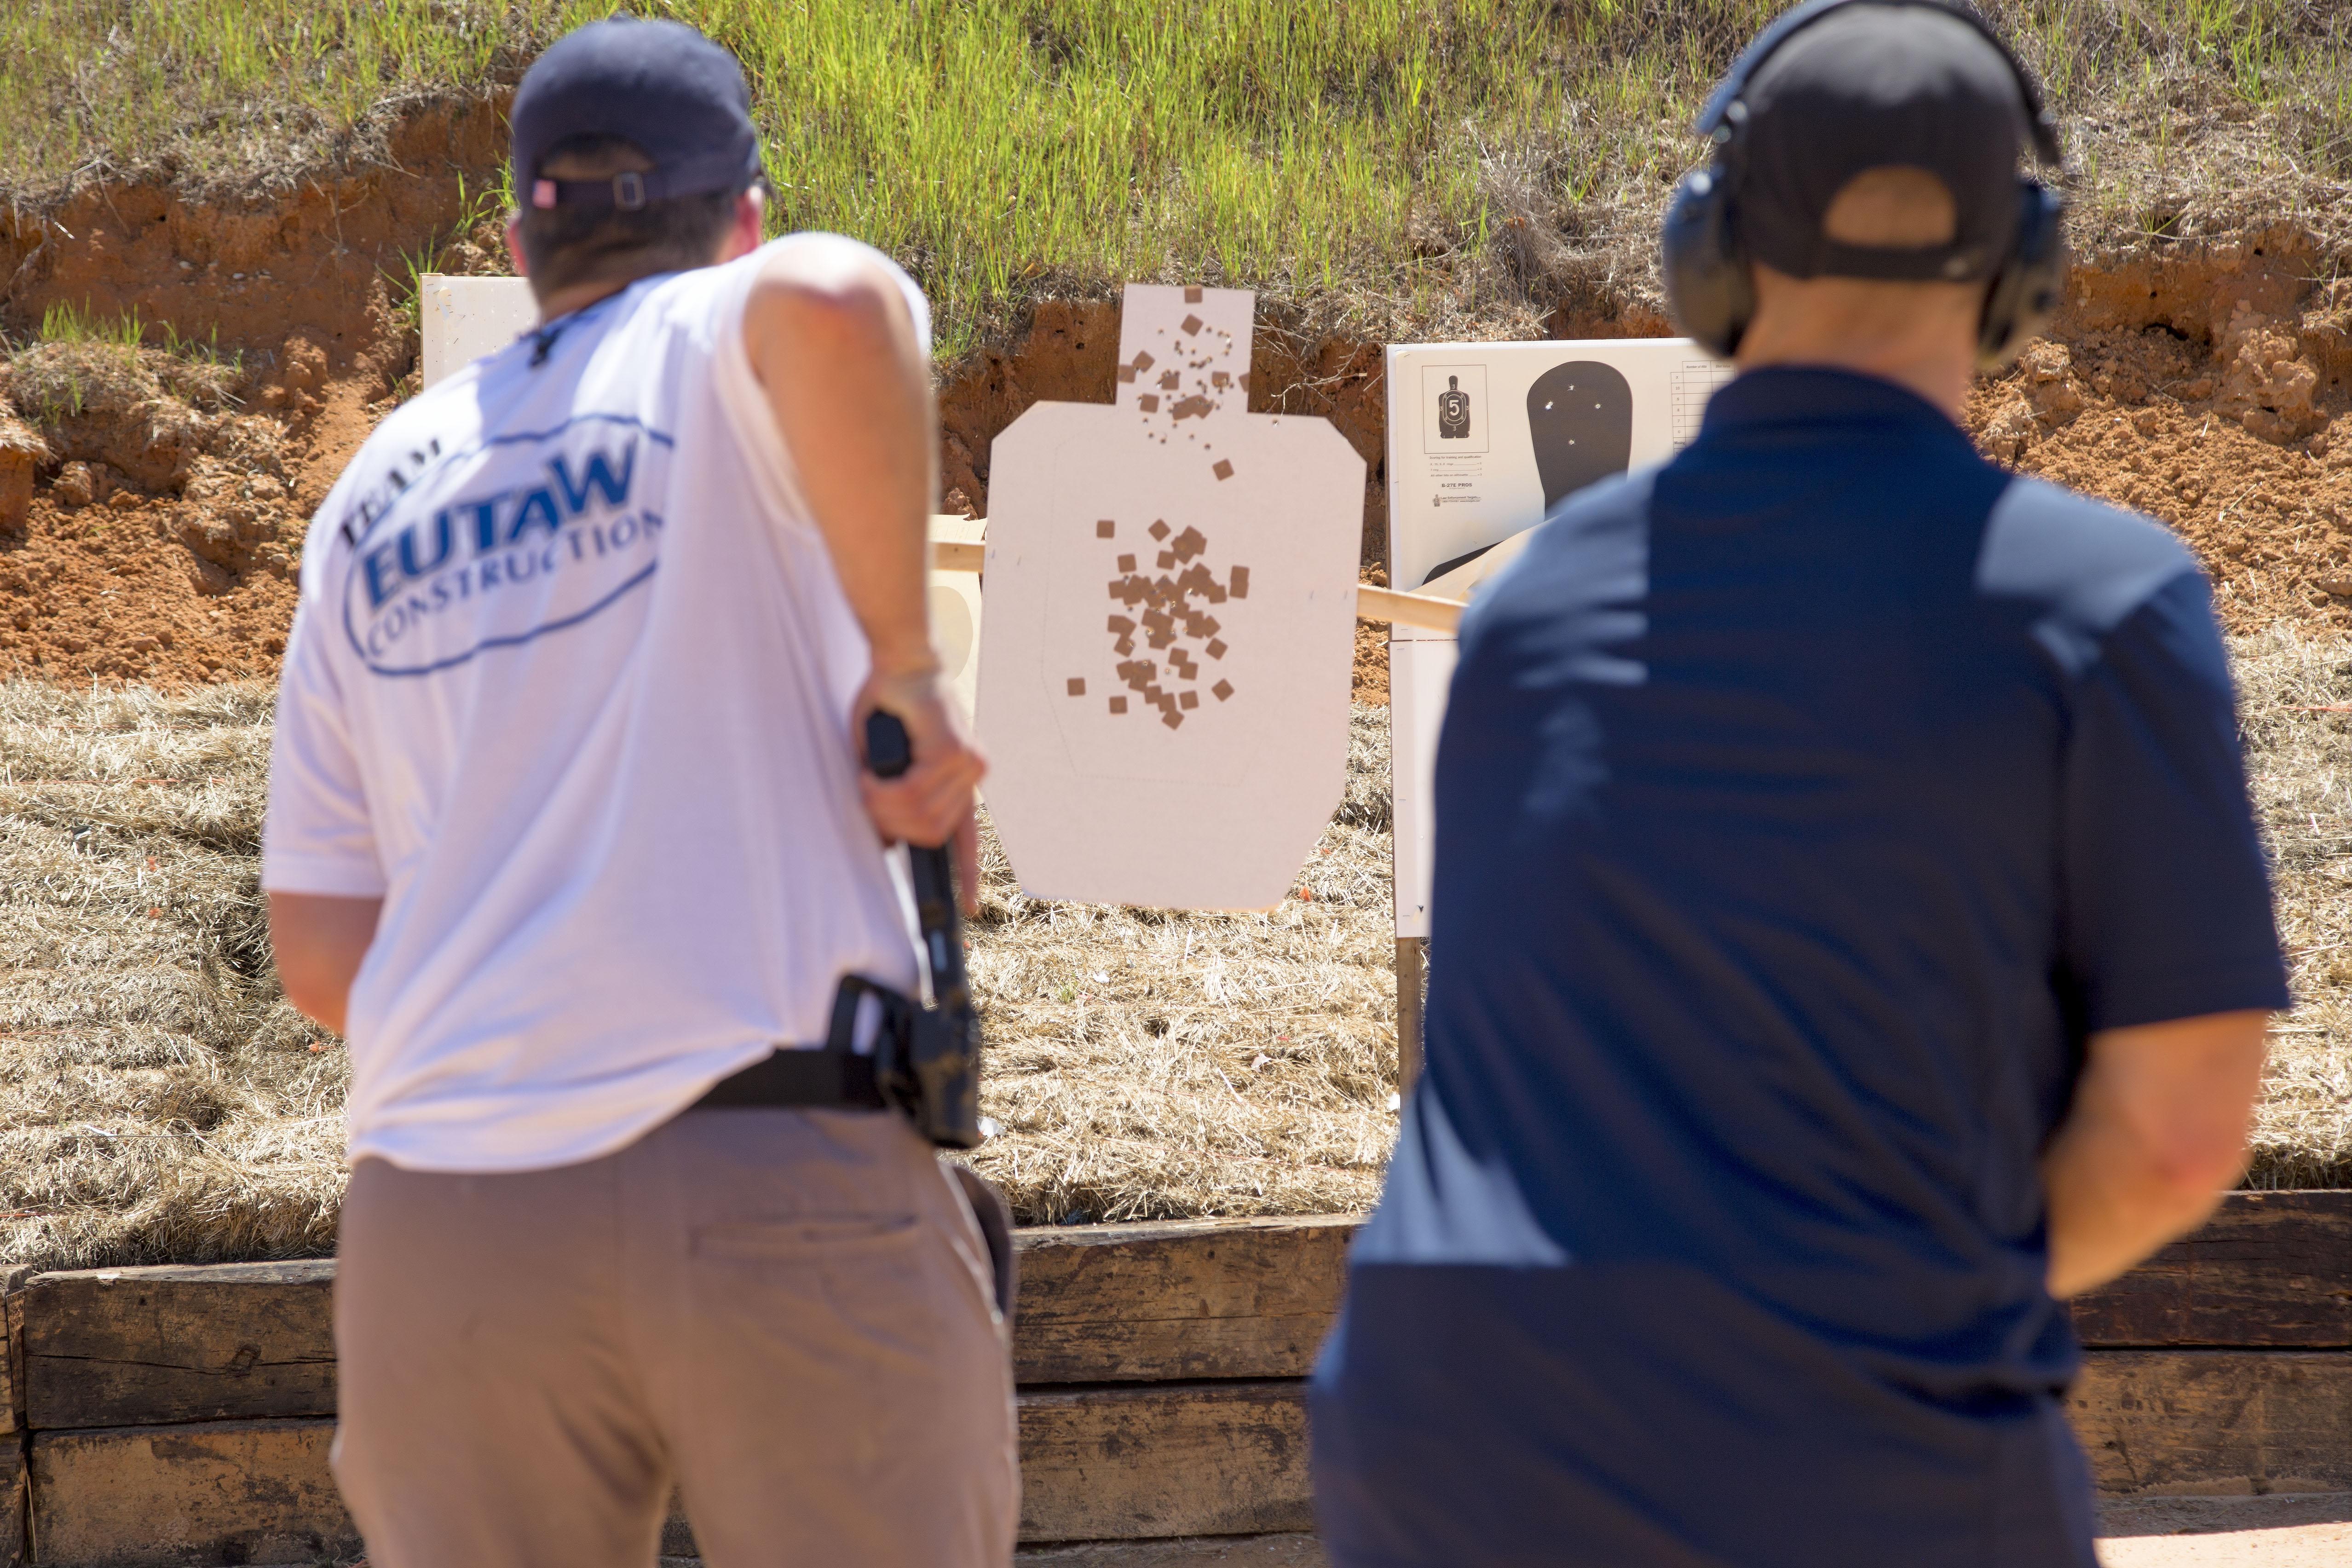 shooting moving targets